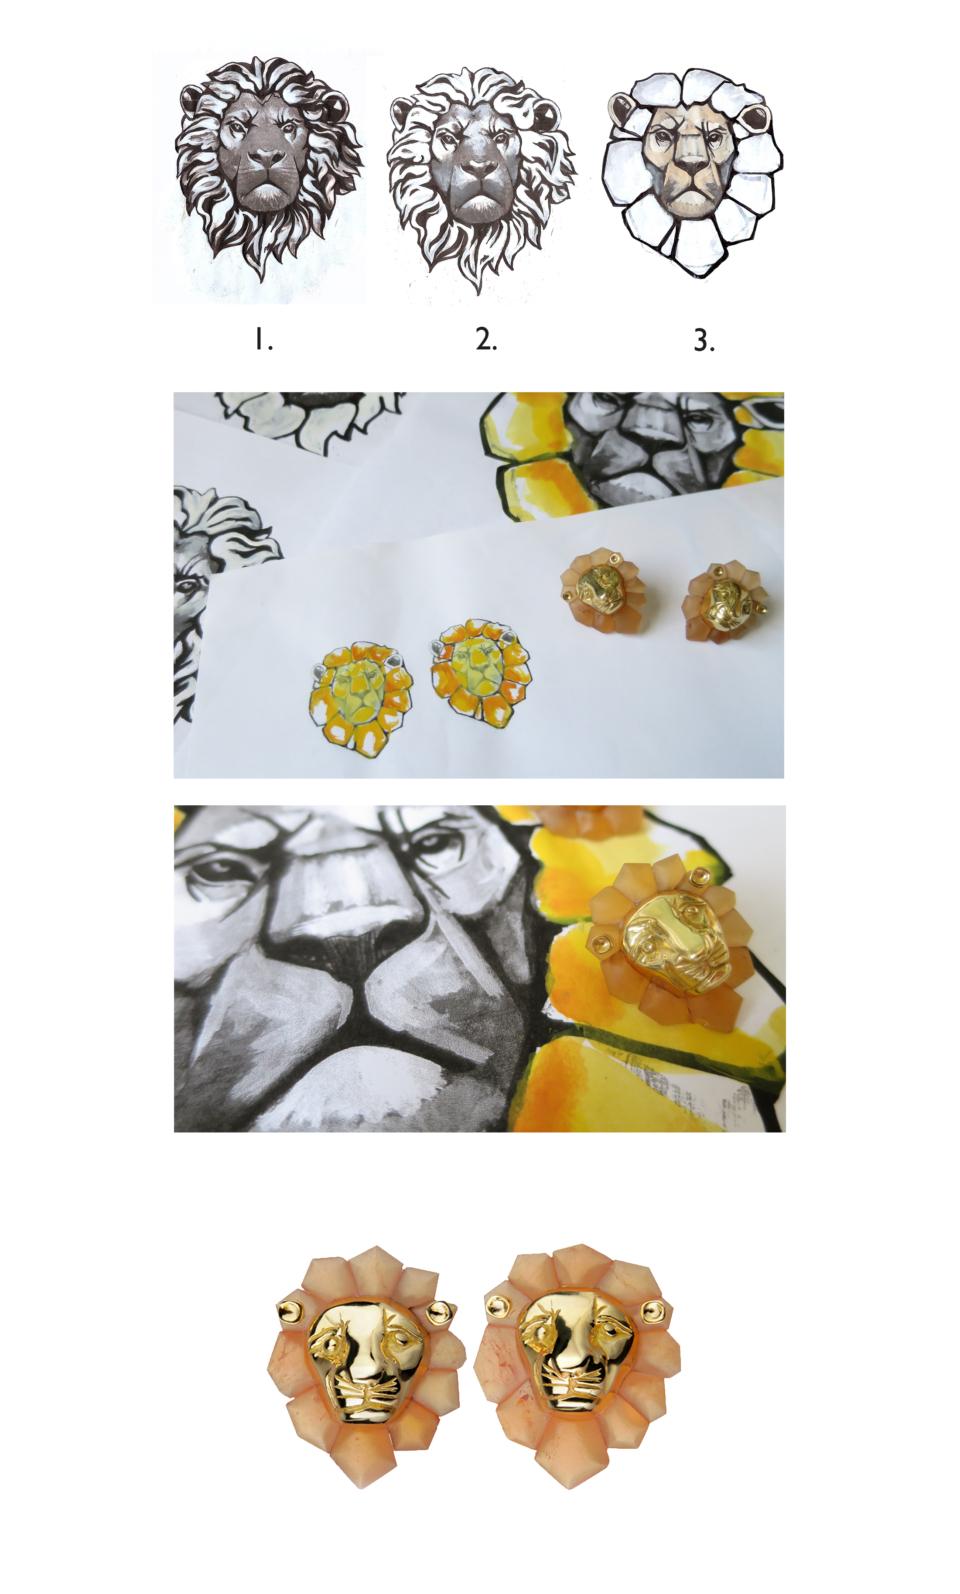 Bespoke gold and grapefruit quartz lion head earrings by Tessa Packard London Contemporary Fine Jewellery